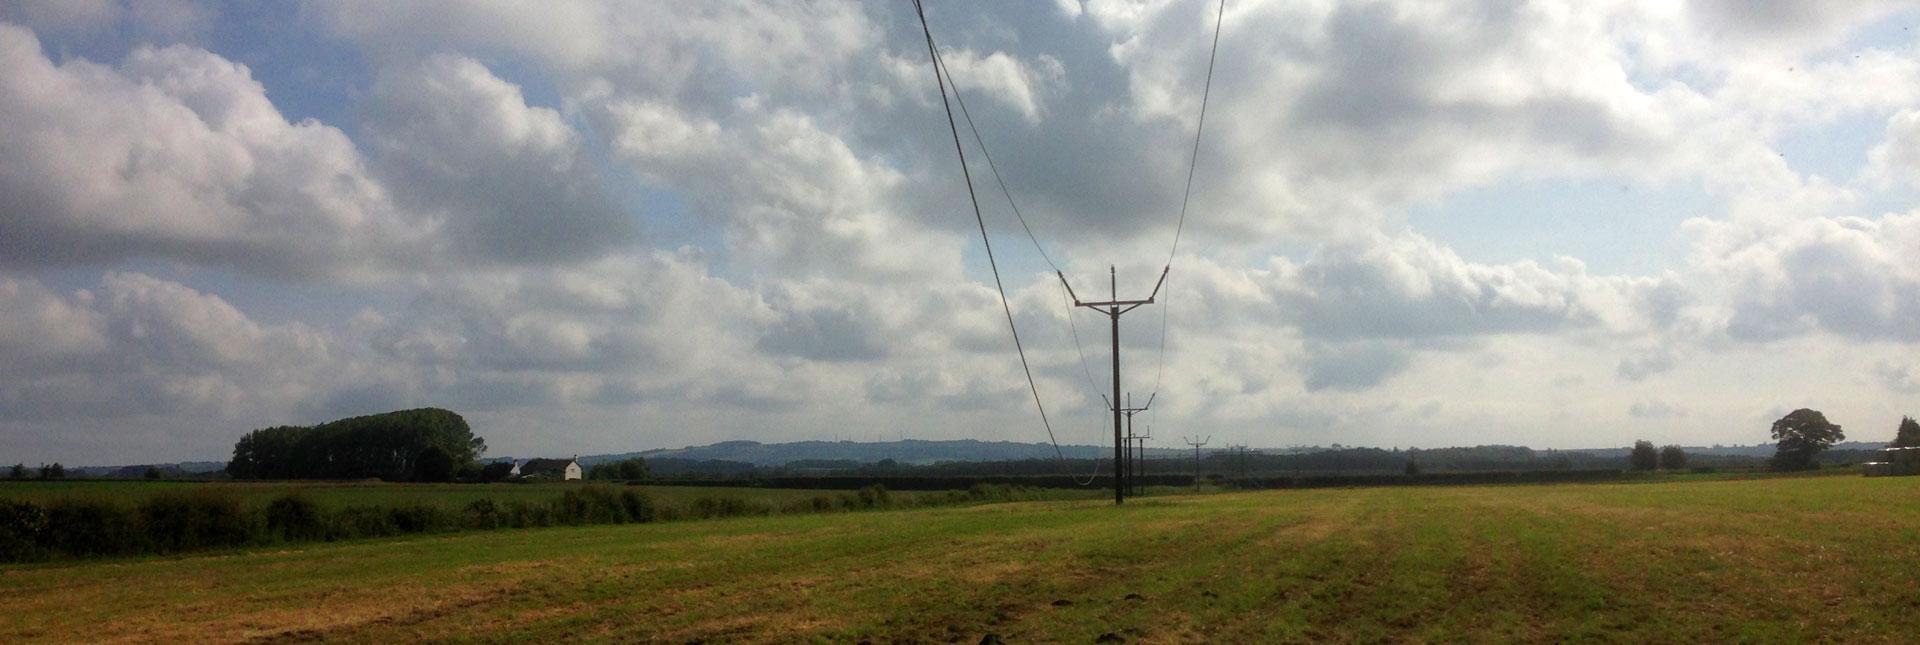 independent-connection-provider-ireland-uk-electricity-worx-overhead-lines-Ireland